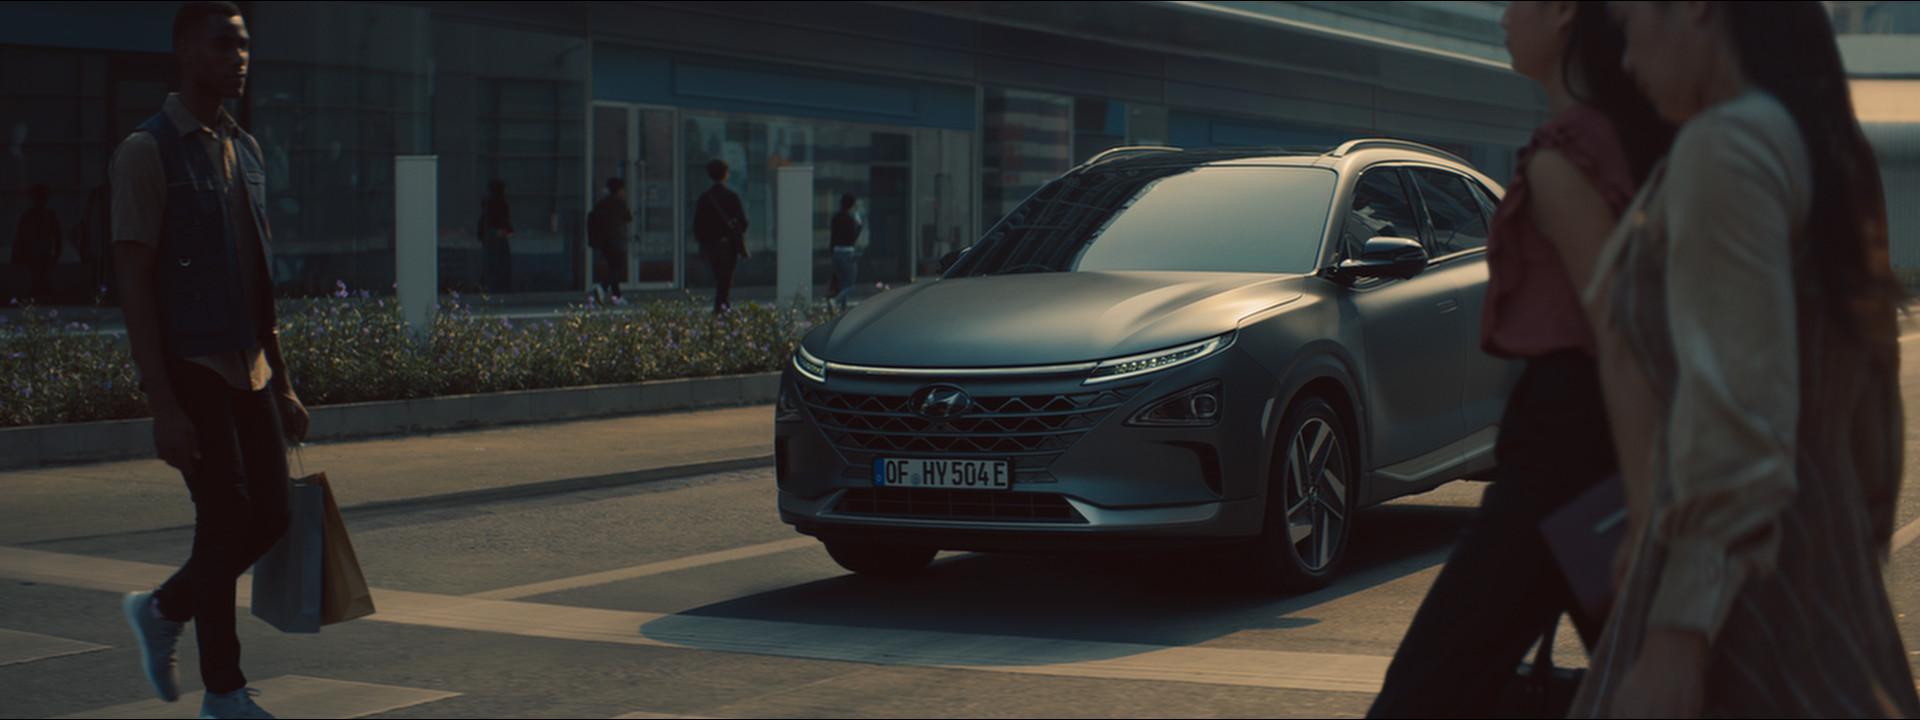 Hyundai Motor launches new communication campaign